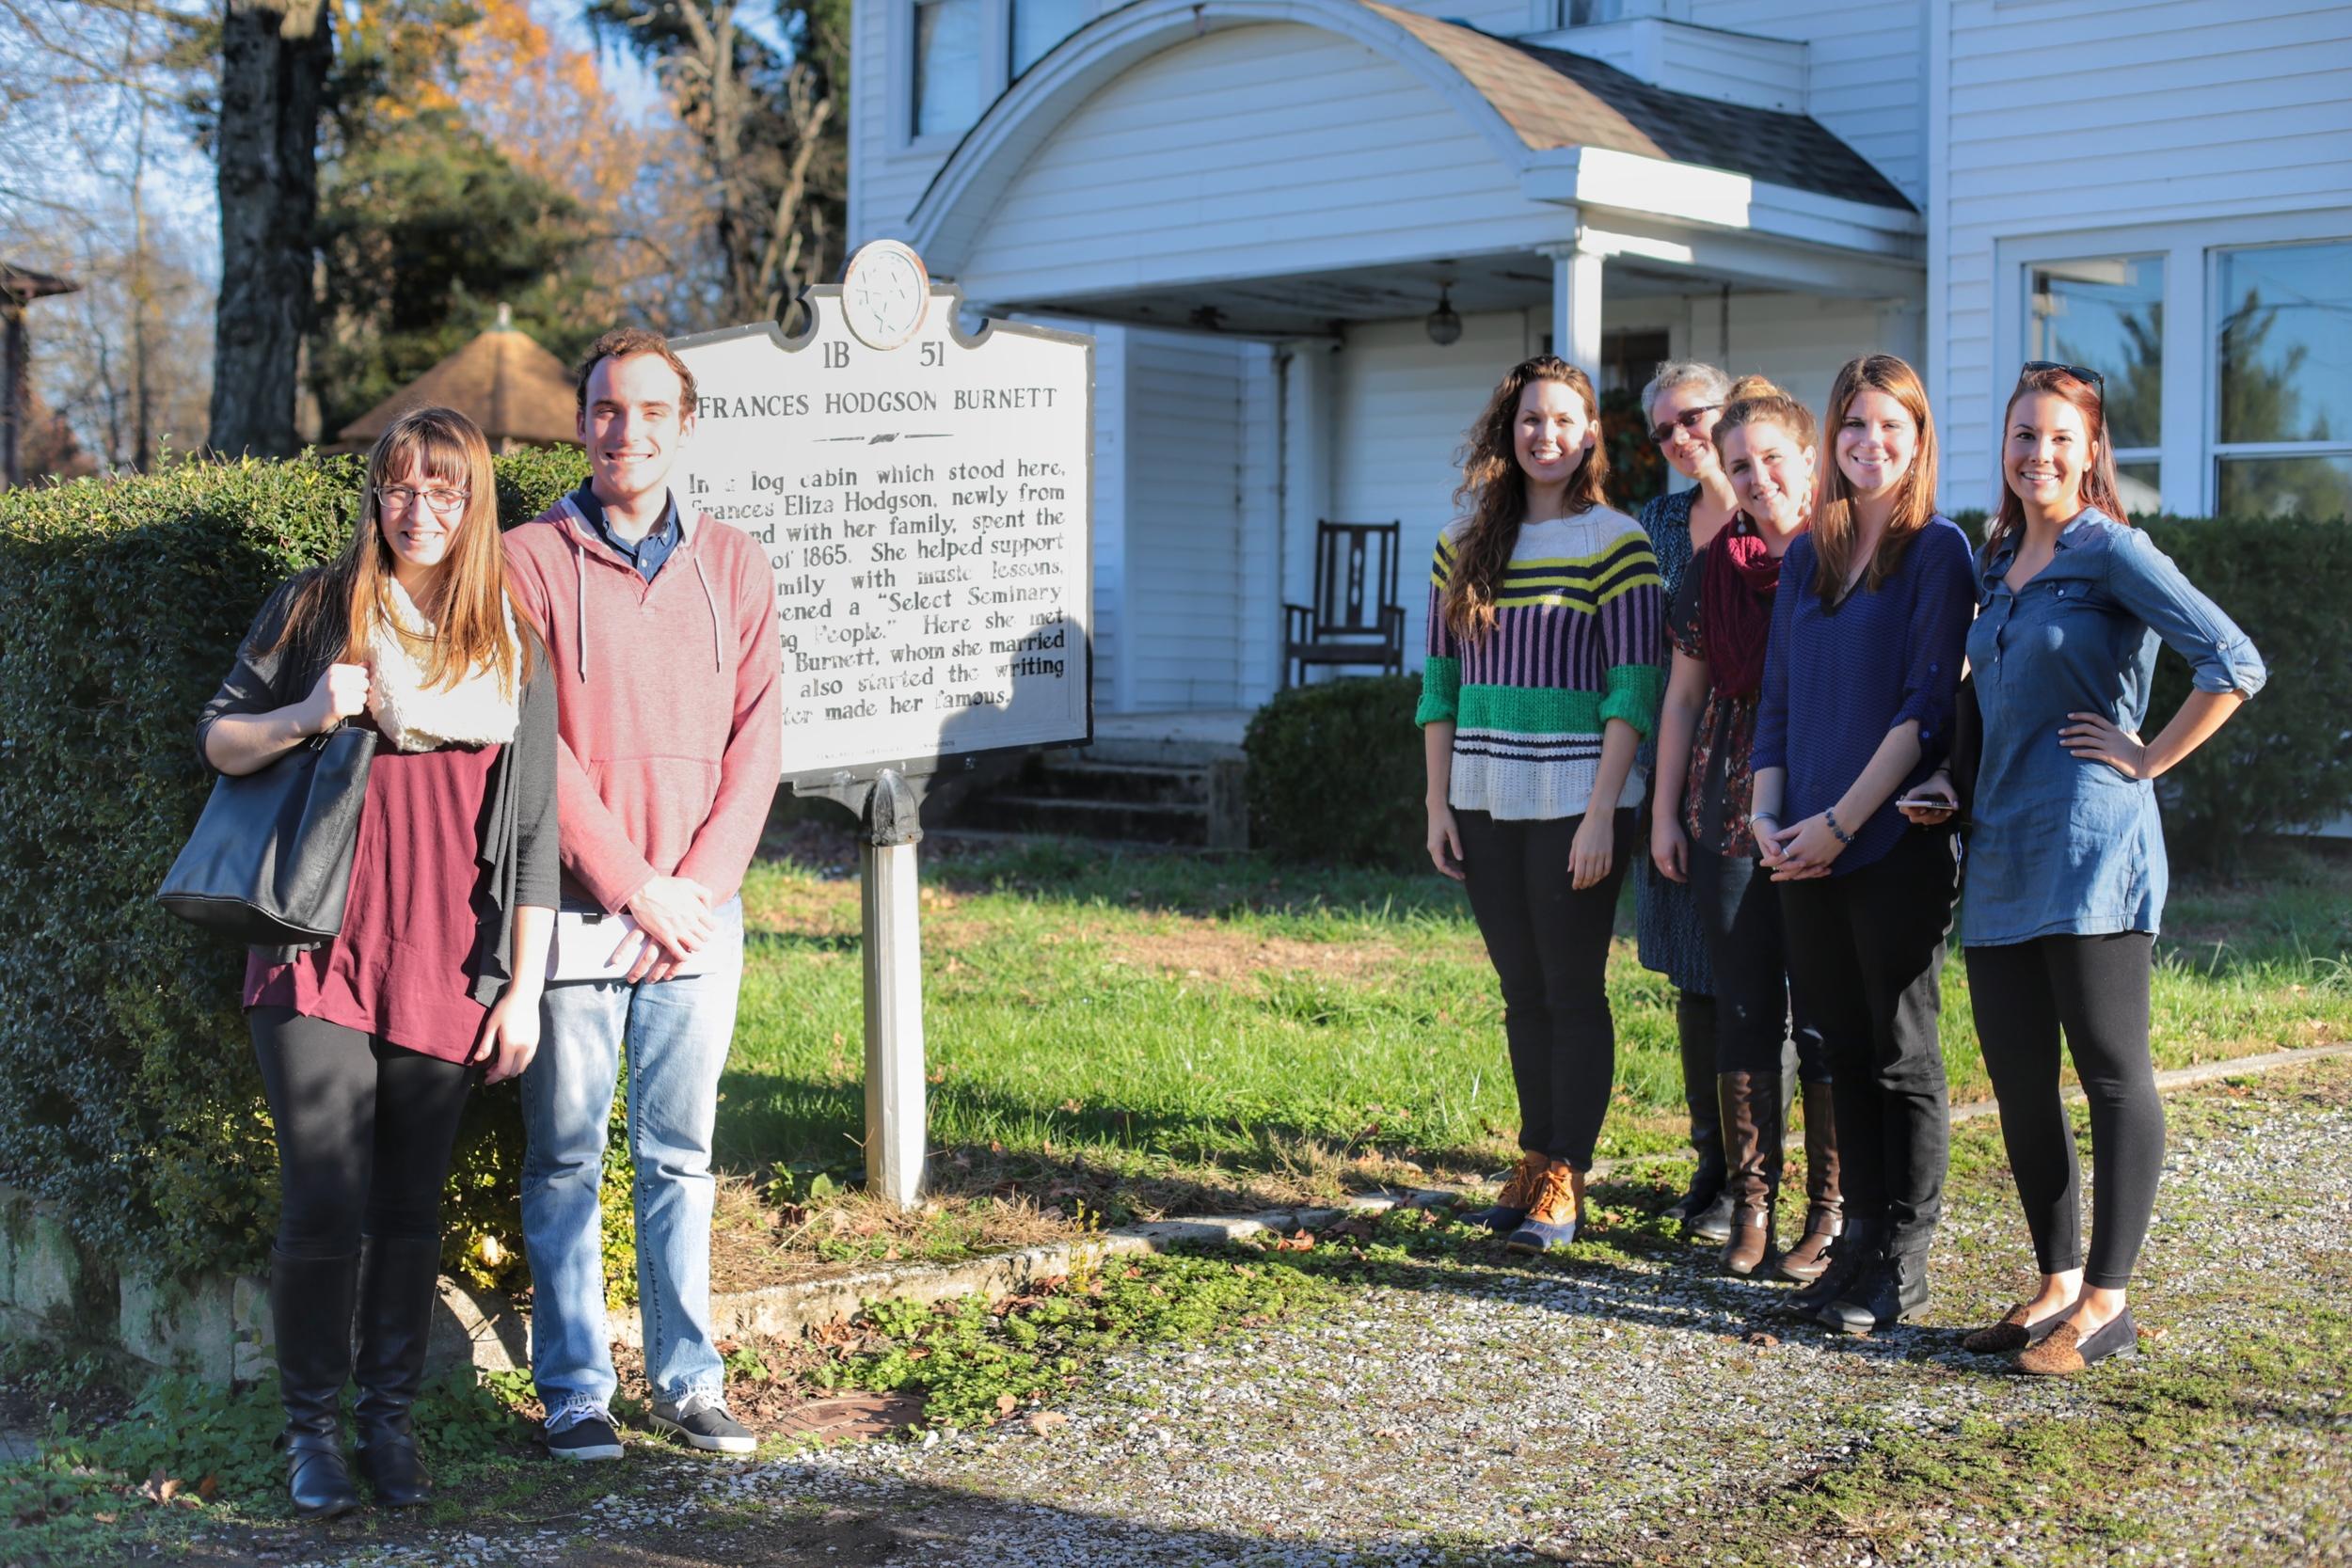 All seven students in front of Frances Hodgson Burnett's first American homesite in New Market, TN.